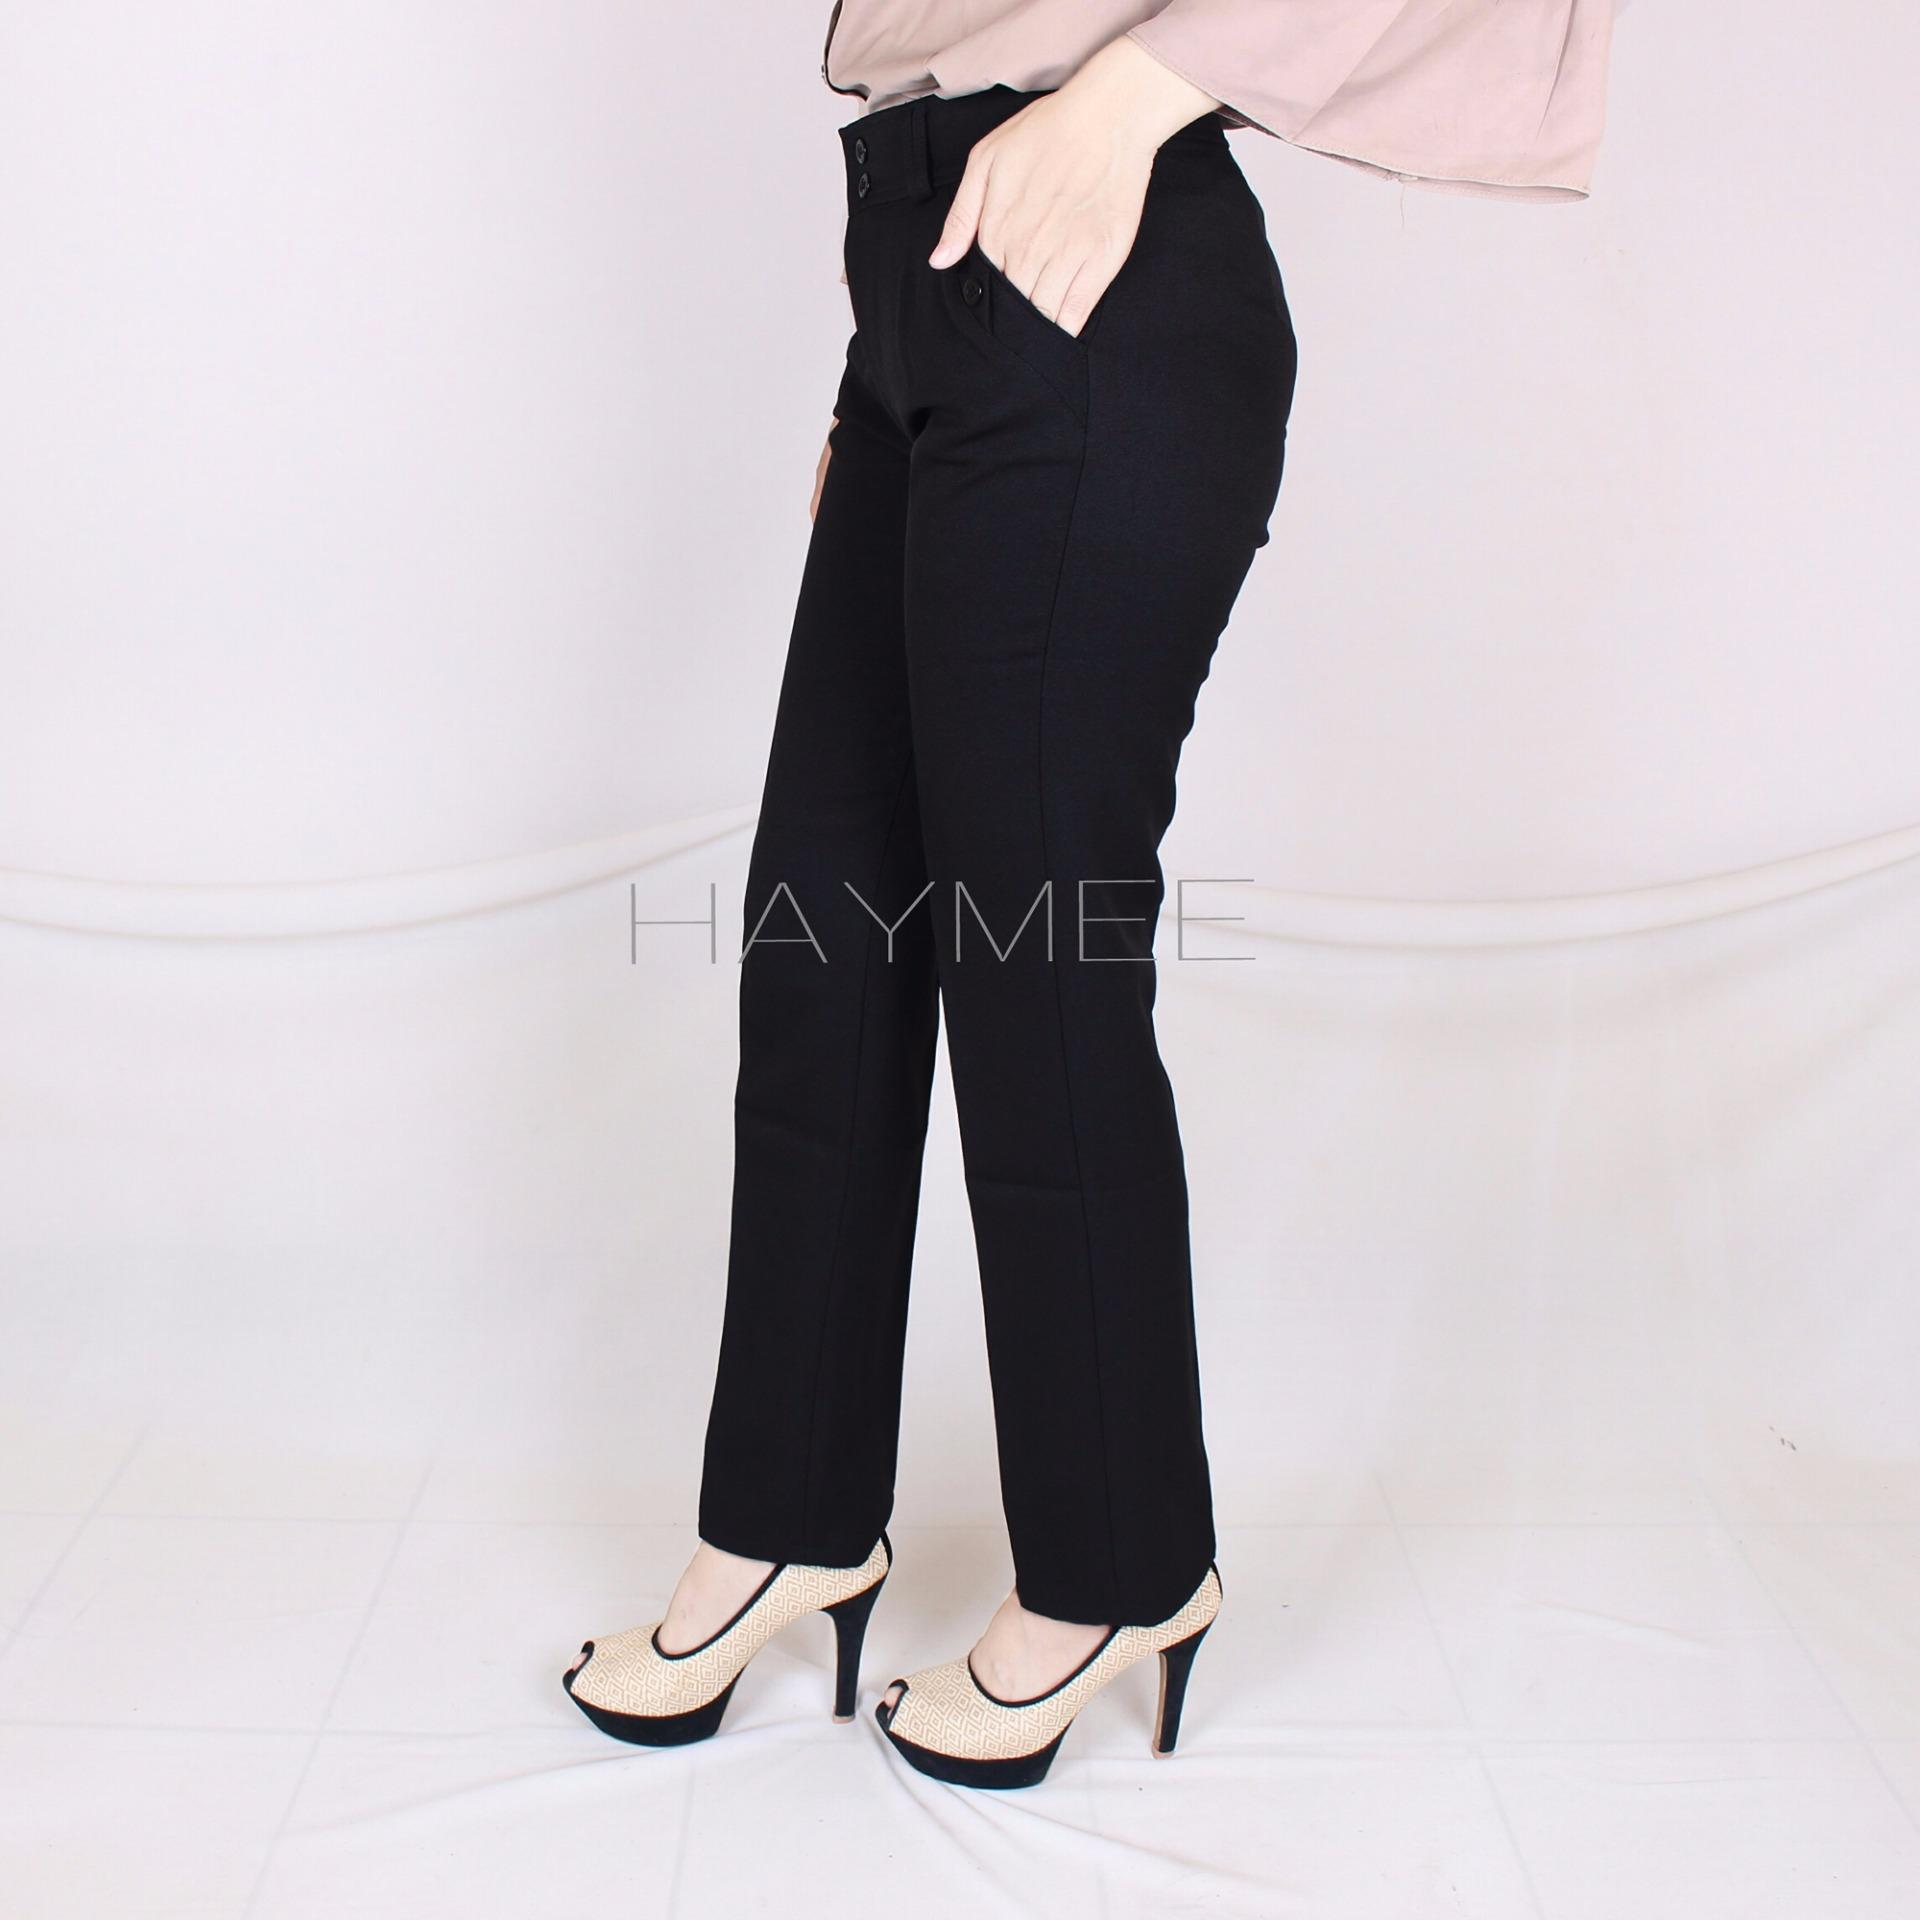 Promo Haymeestore Celana Kantor Wanita Celana Kerja Cewek Celana Formal Cewe Premium Casual Fashion Di Banten